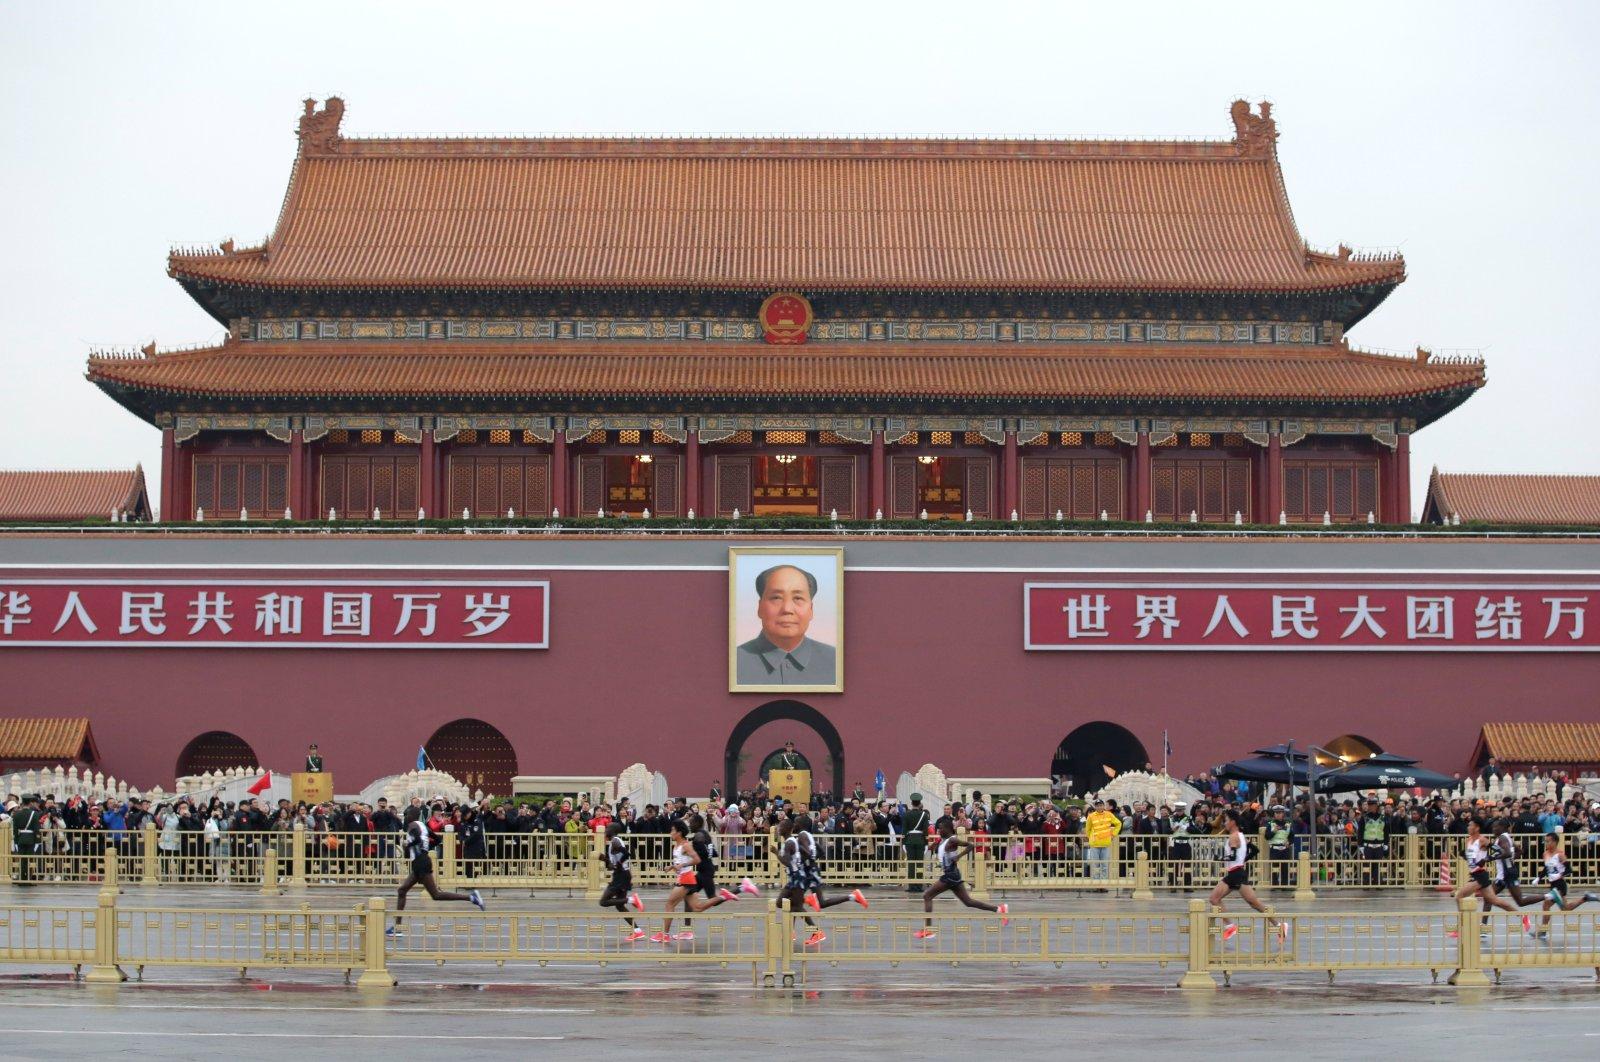 Leading athletes run past Tiananmen Gate during the annual Beijing Marathon in Beijing, China, Nov. 3, 2019. (Reuters Photo)